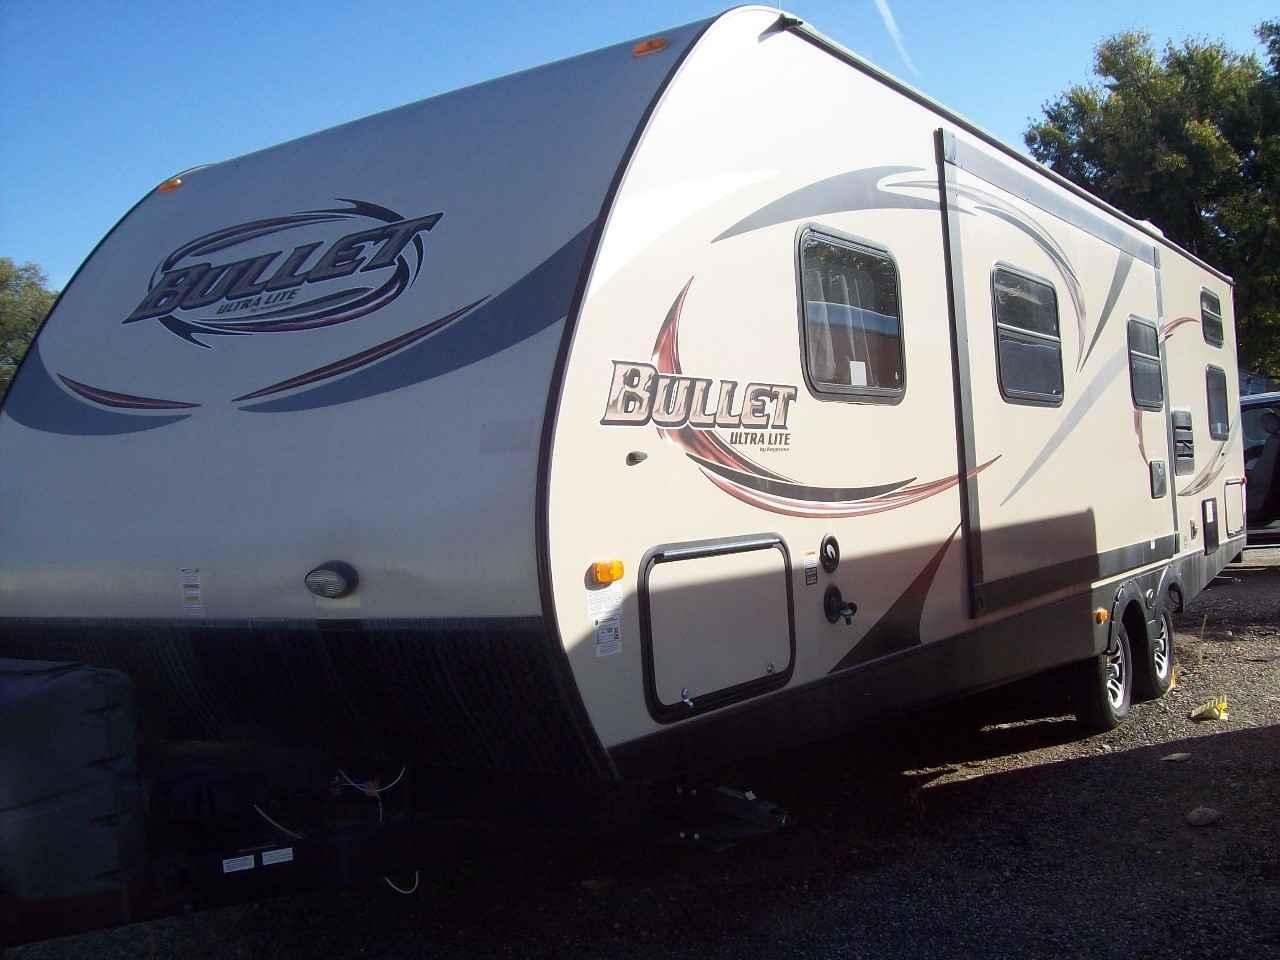 2014 Used Keystone BULLET ULTRA LITE Travel Trailer in ...